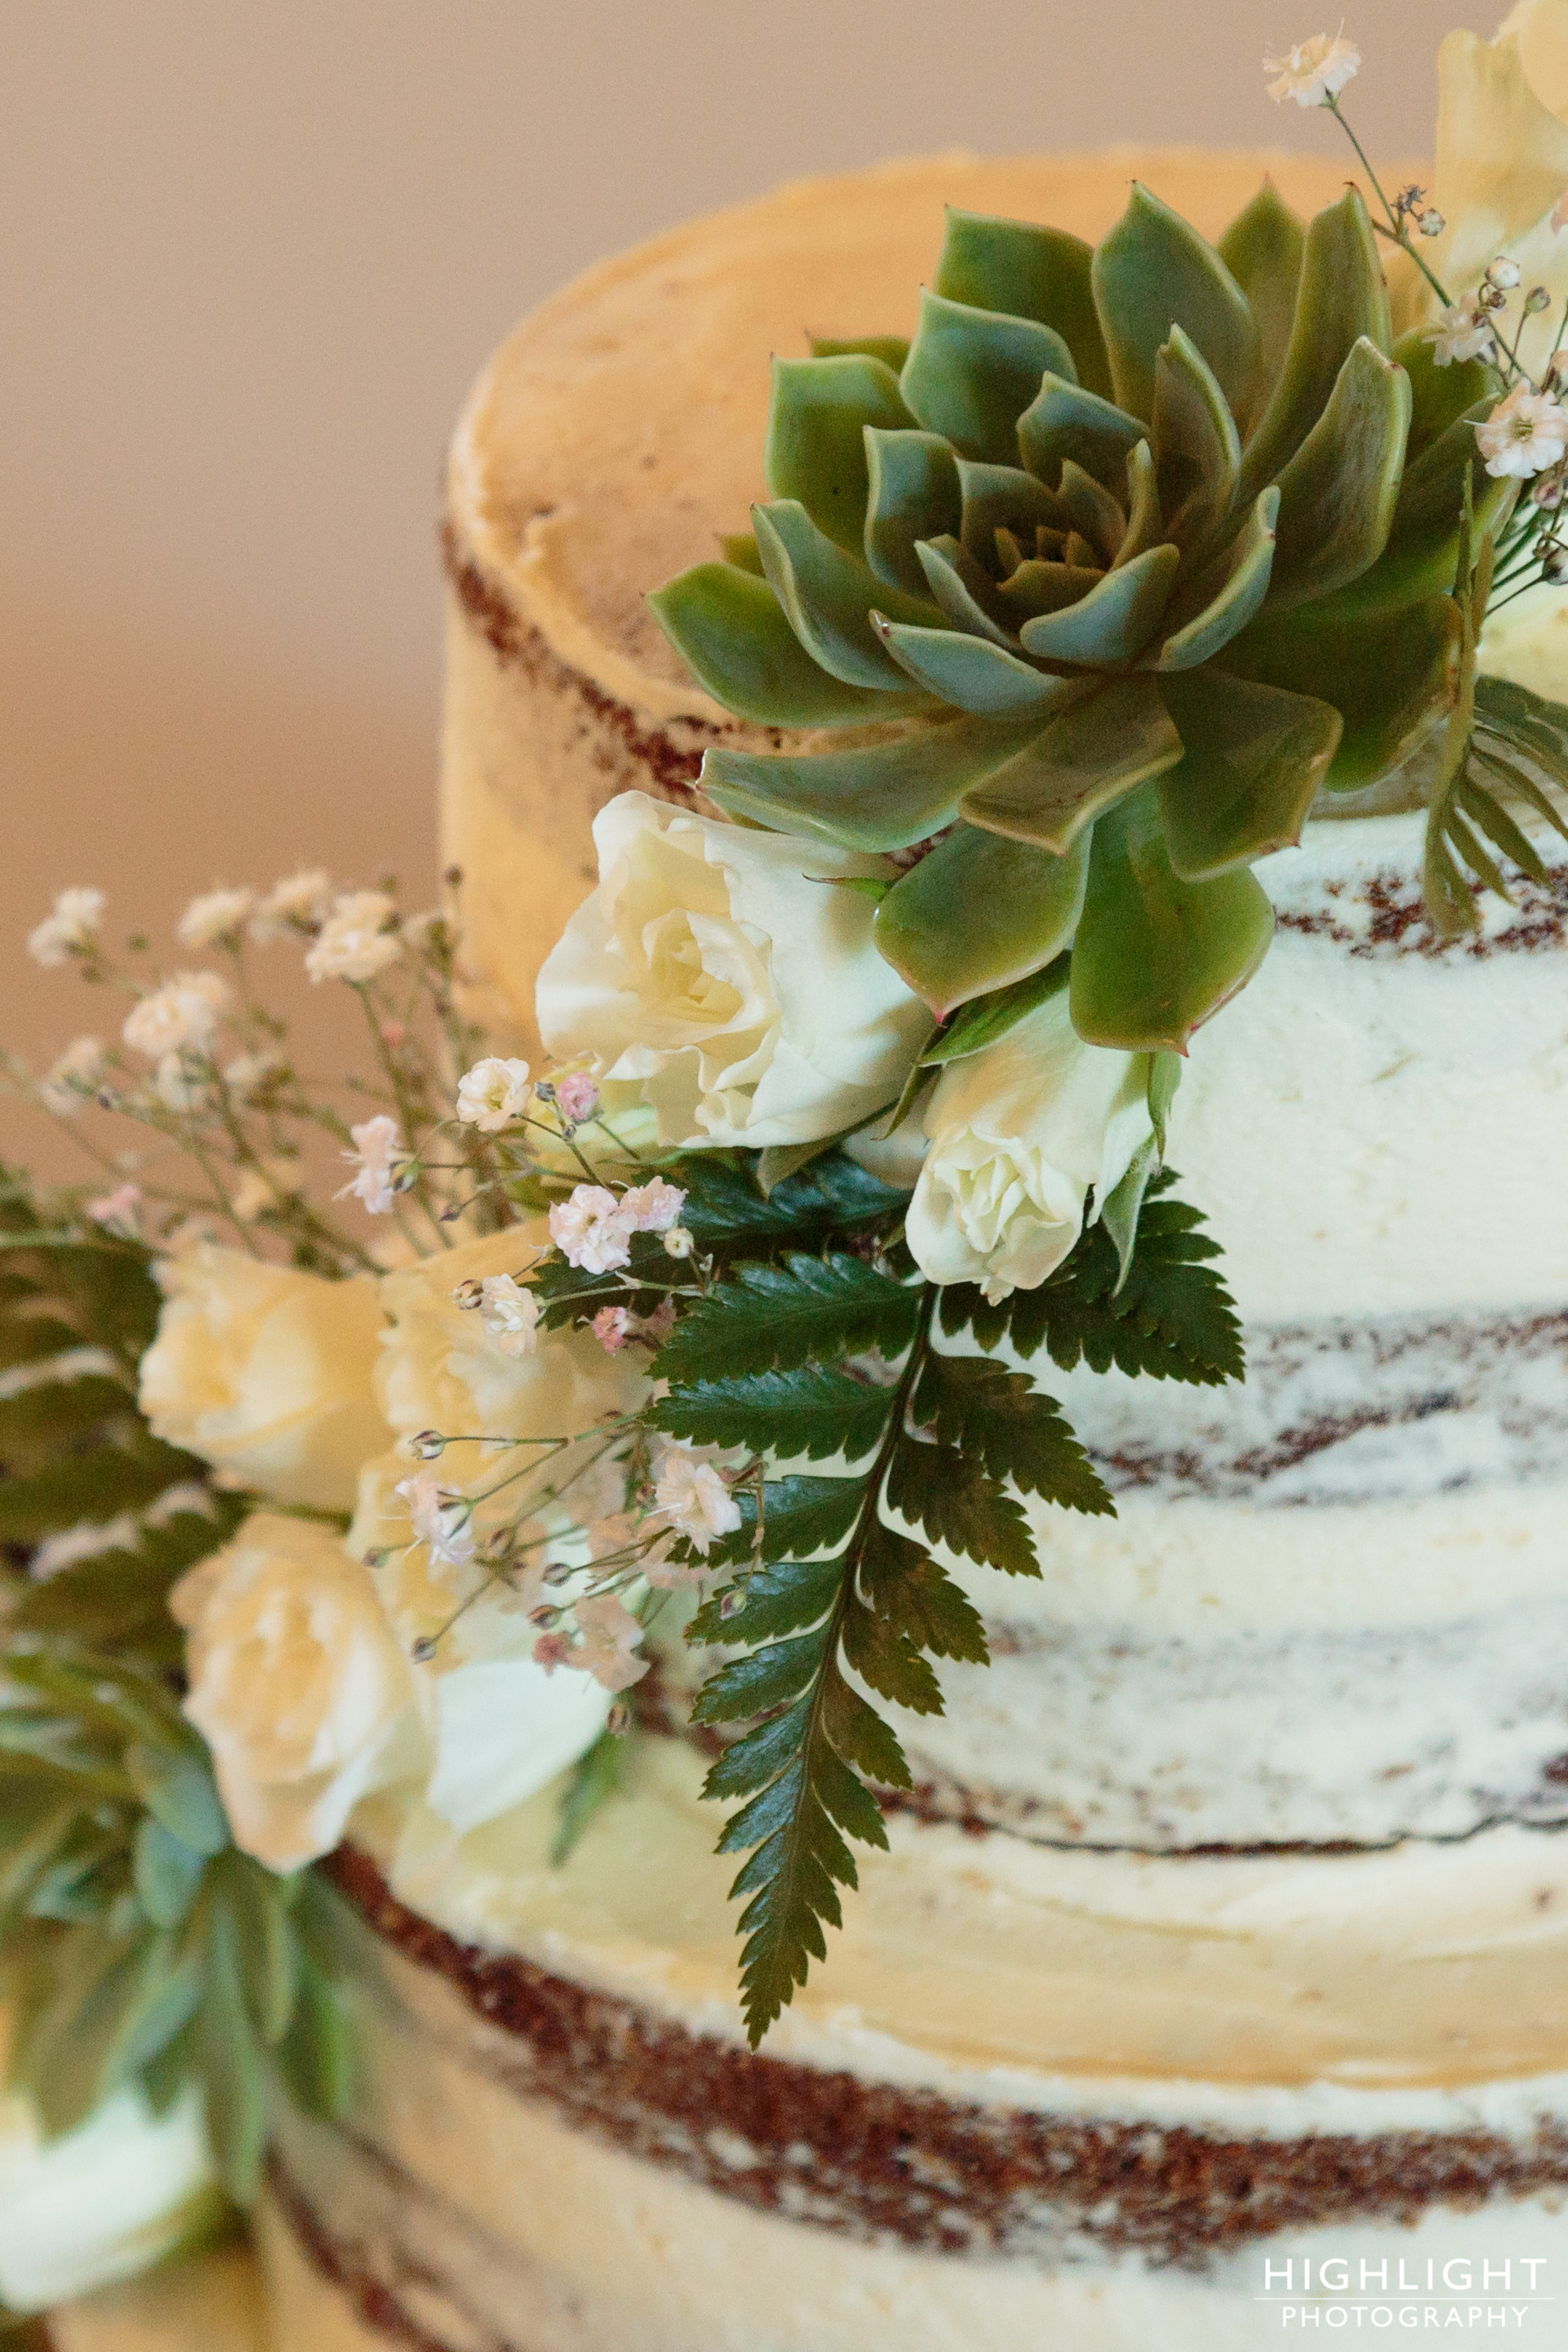 highlight_wedding_photography_makoura_lodge_manawatu_new_zealand-16.jpg